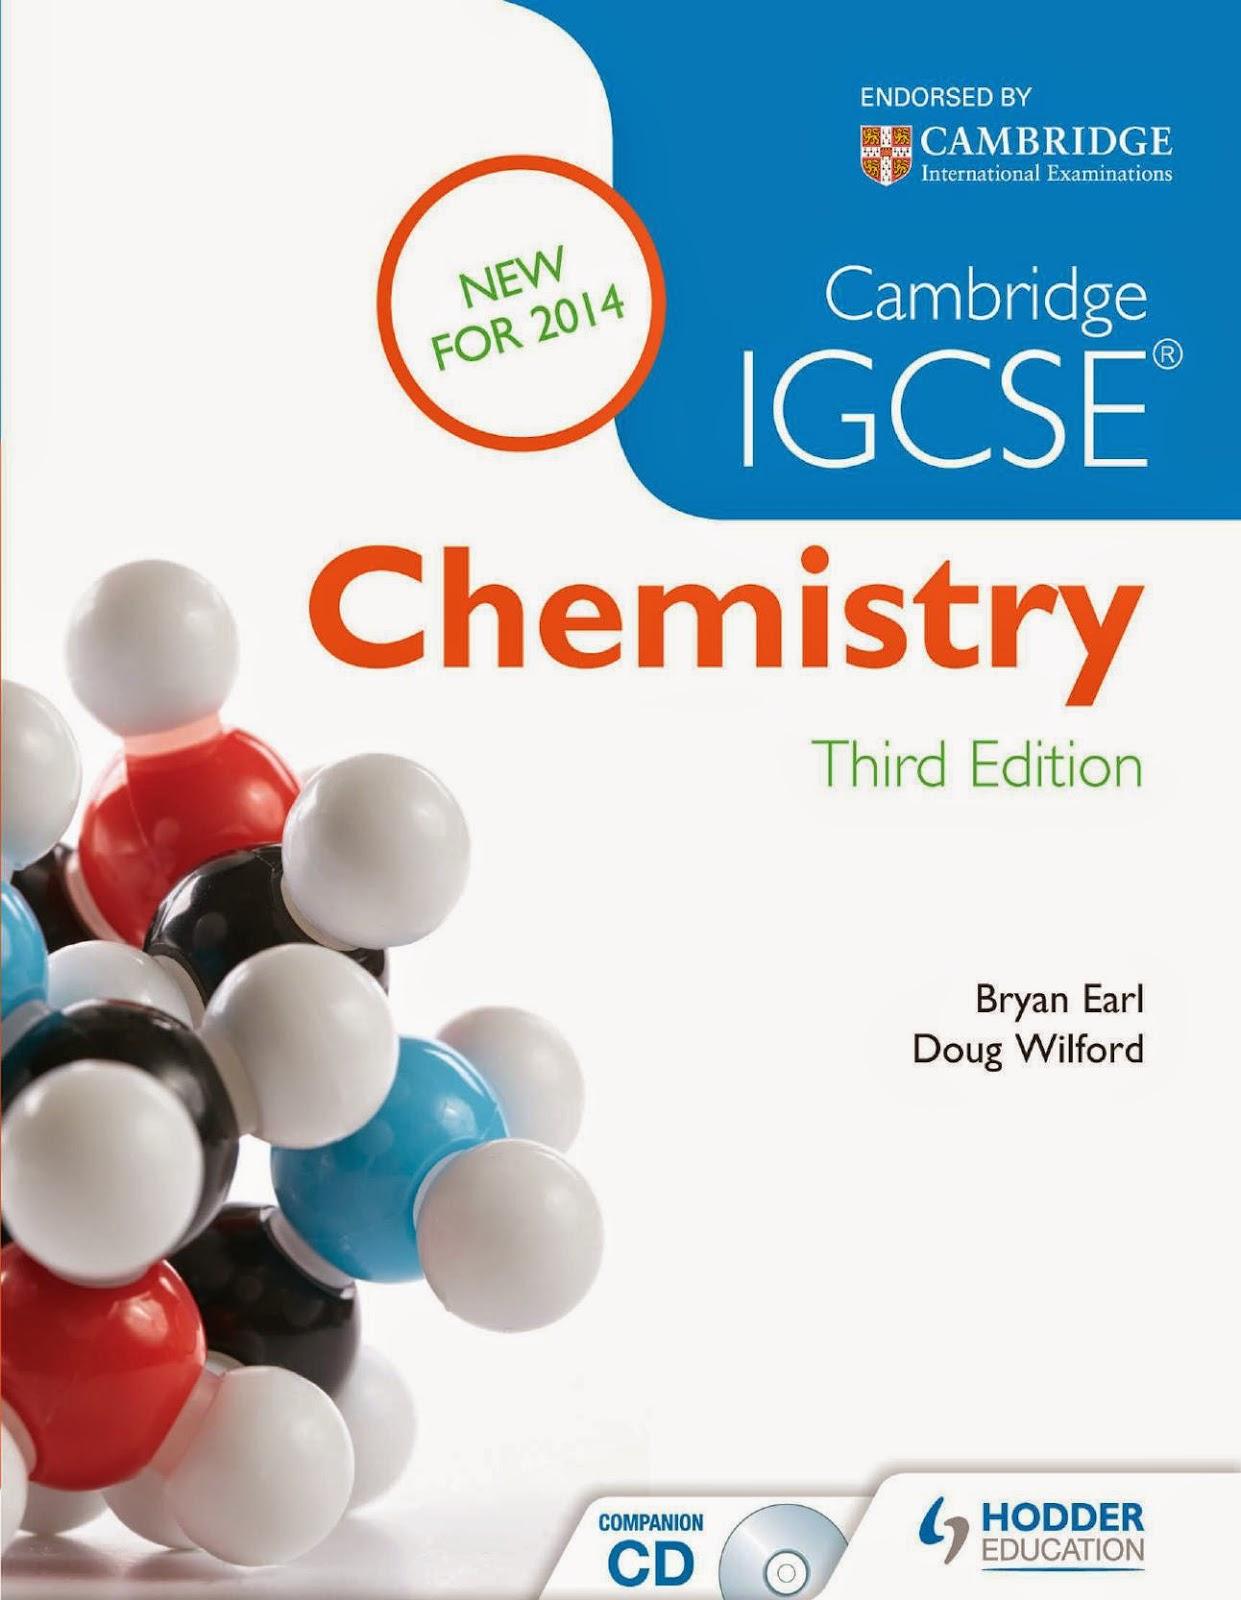 Download & Study: IGCSE/ GCSE Chemistry - Text Books/ Ebooks/ Guides